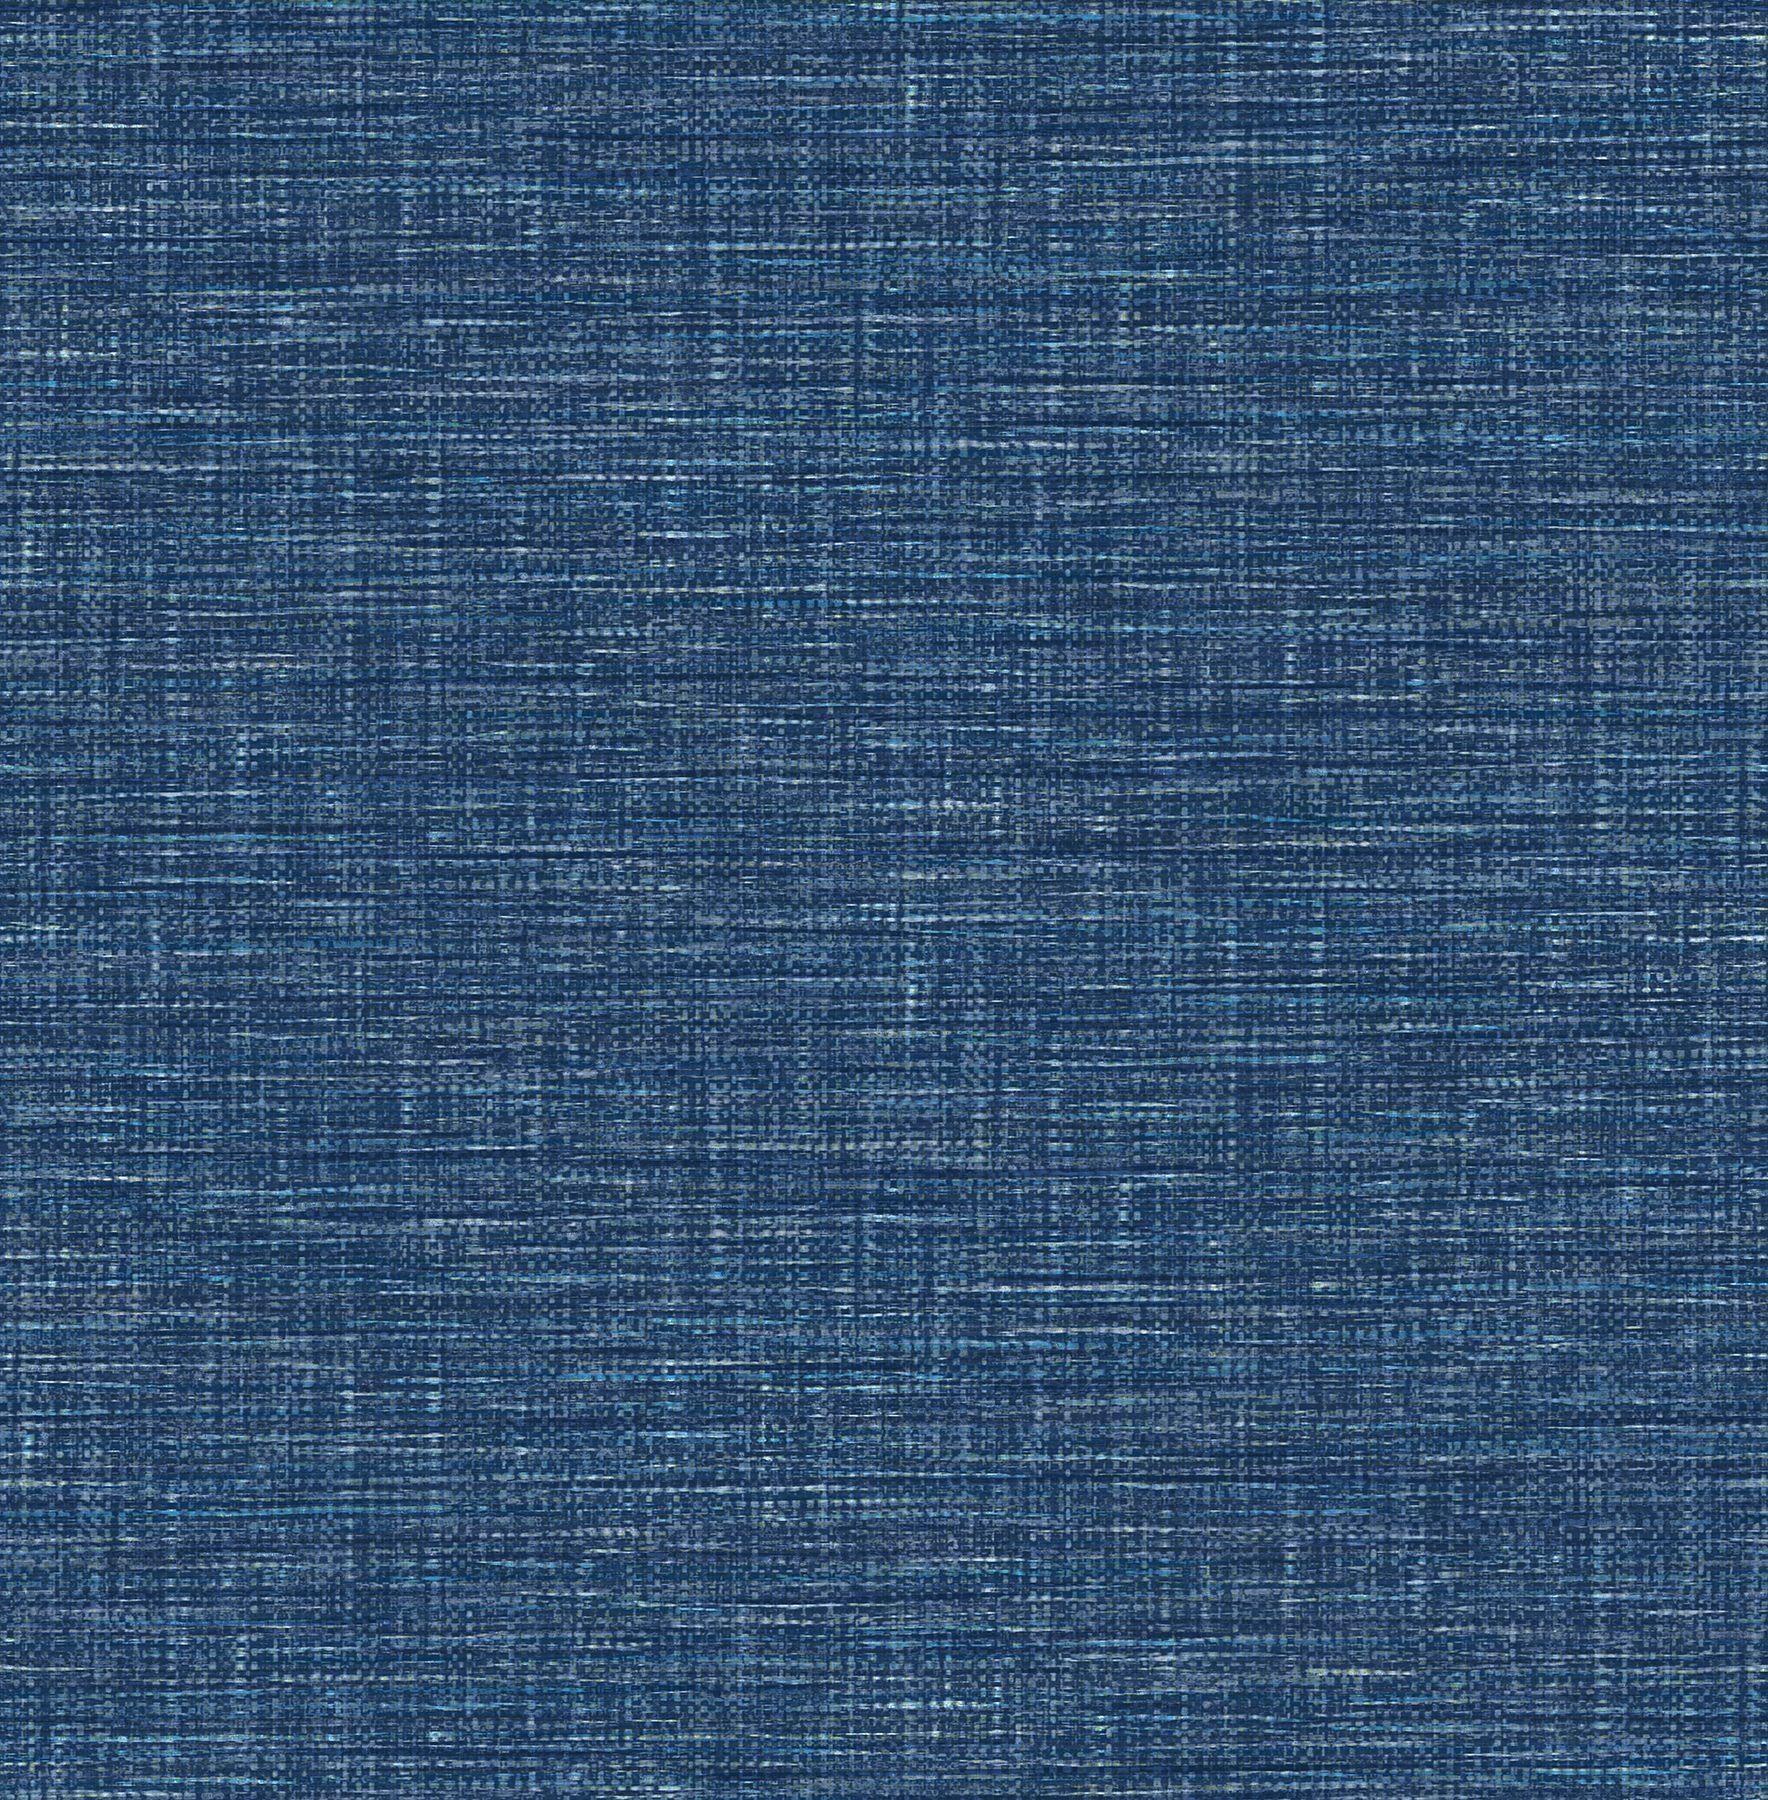 Exhale Dark Blue Faux Grasscloth Wallpaper Grasscloth Wallpaper Grasscloth Denim Wallpaper